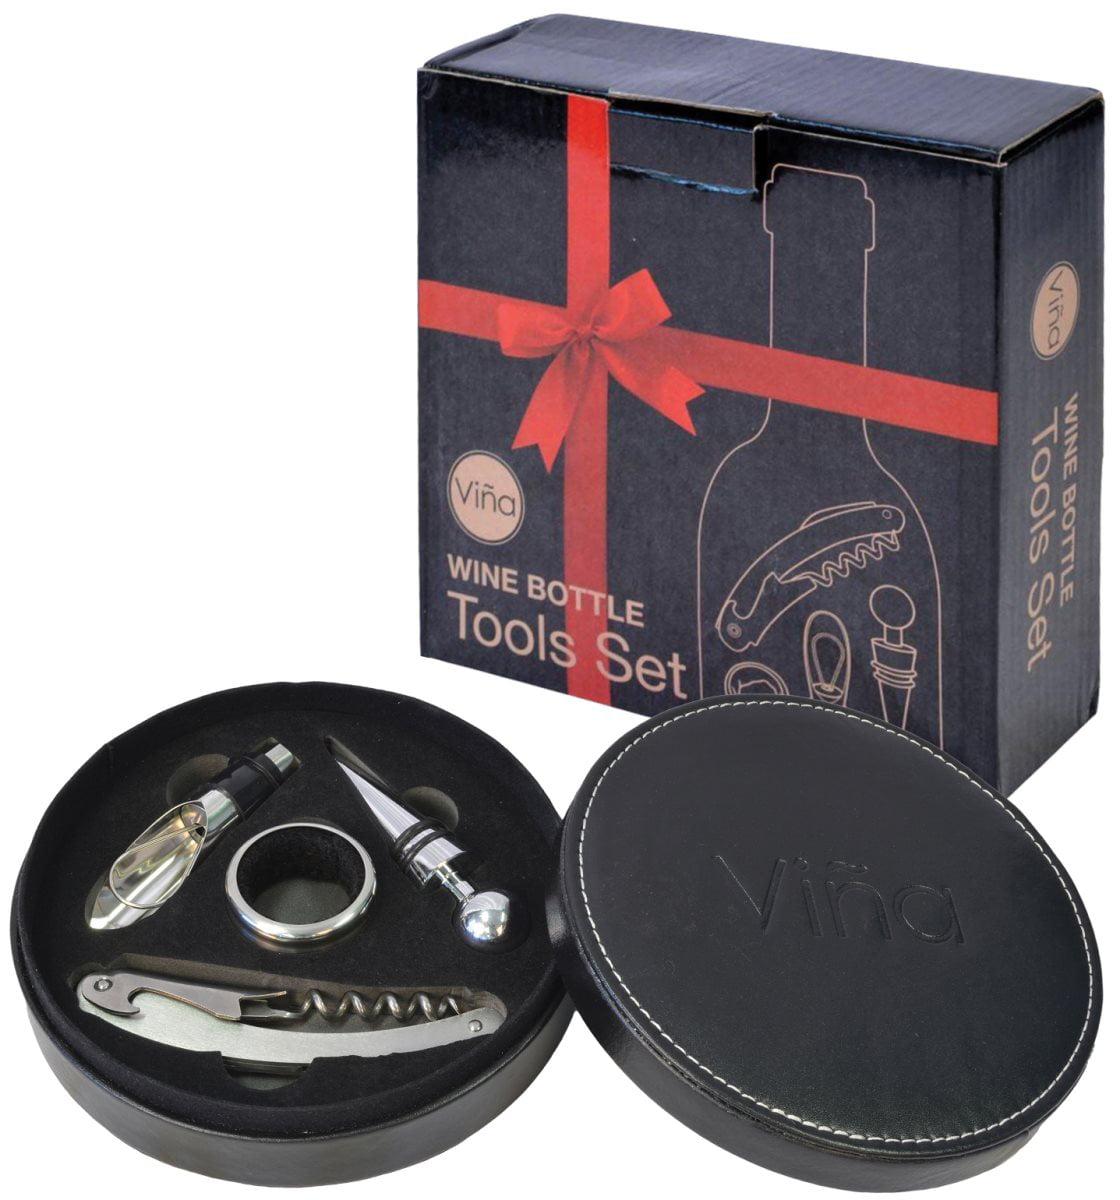 Vina Wine Accessory Bottle Opener Kit 4PCS set in Leather Gift Box, Stainless Steel Corkscrew + Wine Collar... by Vina